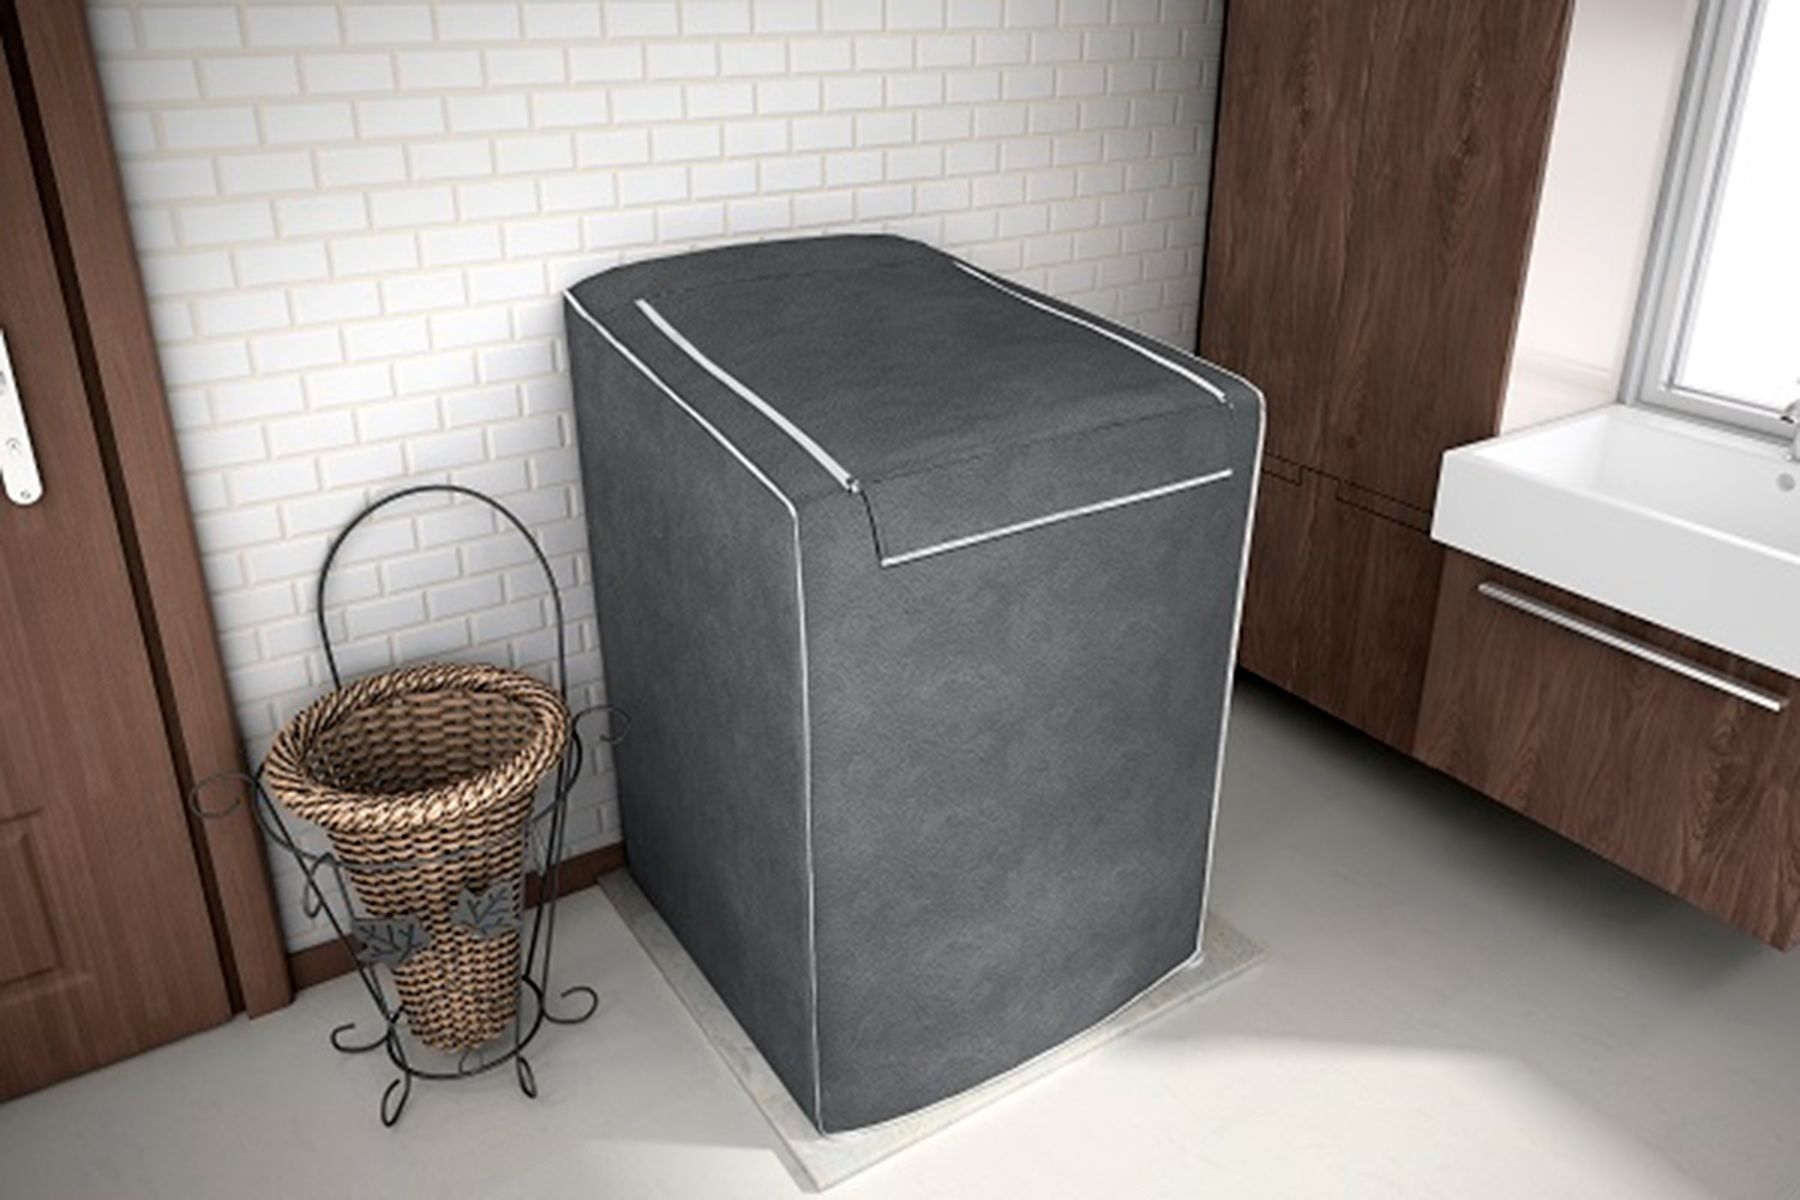 Capa P/ Maquina De Lavar Roupas Eletrolux 10kg 11kg 12kg CHUMBO